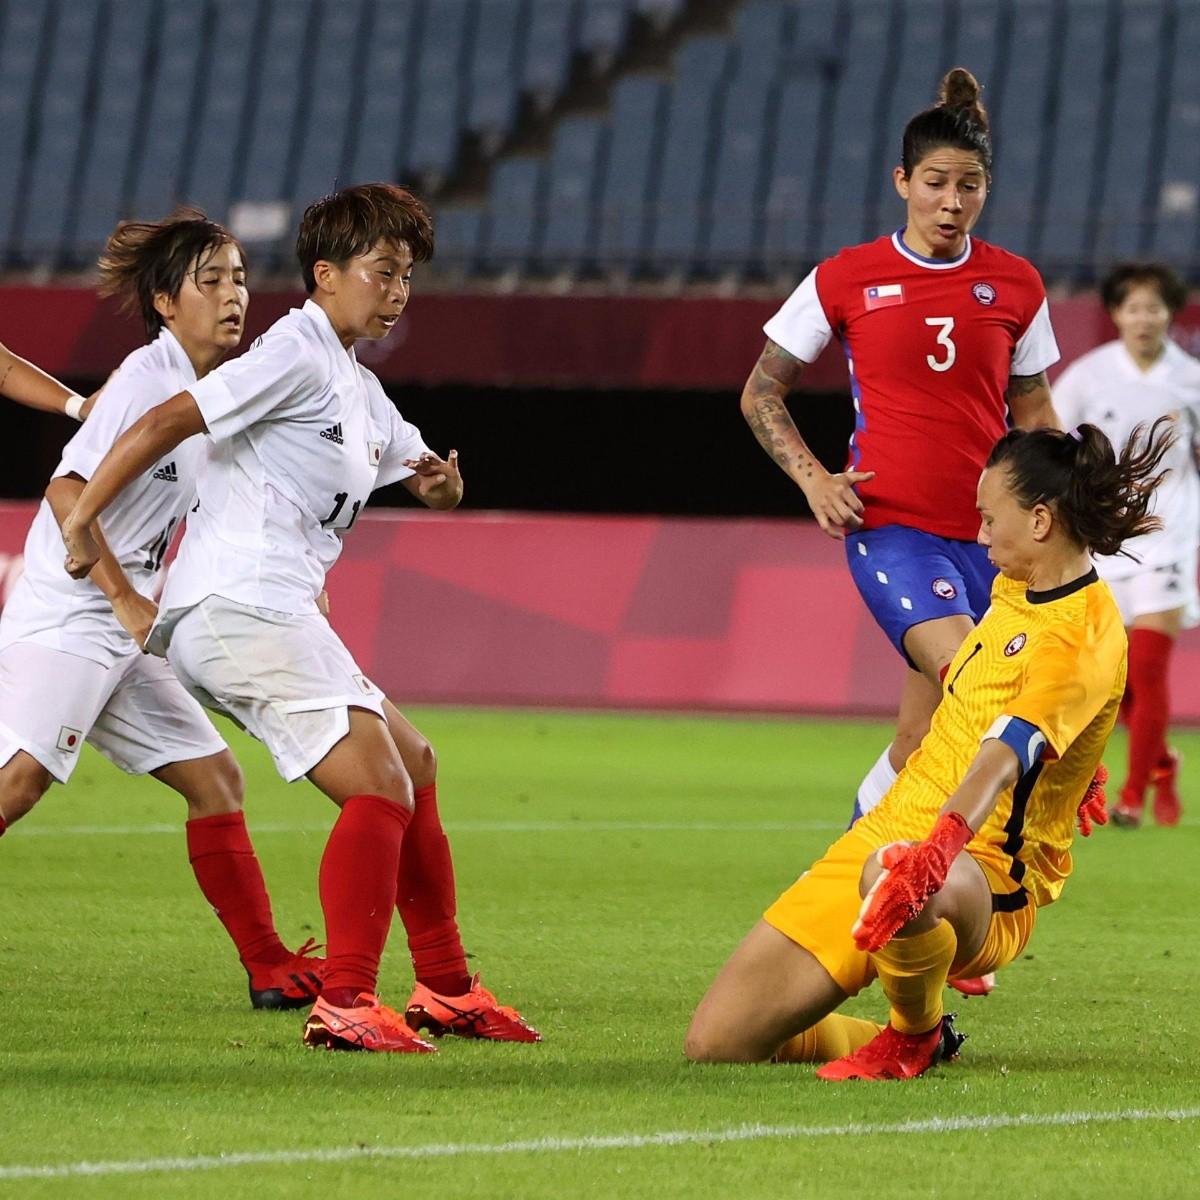 Chile Femenino 0-1 Japón | RESULTADO, RESUMEN, VIDEO y GOLES | JJOO Tokio 2020 | Dale Albo